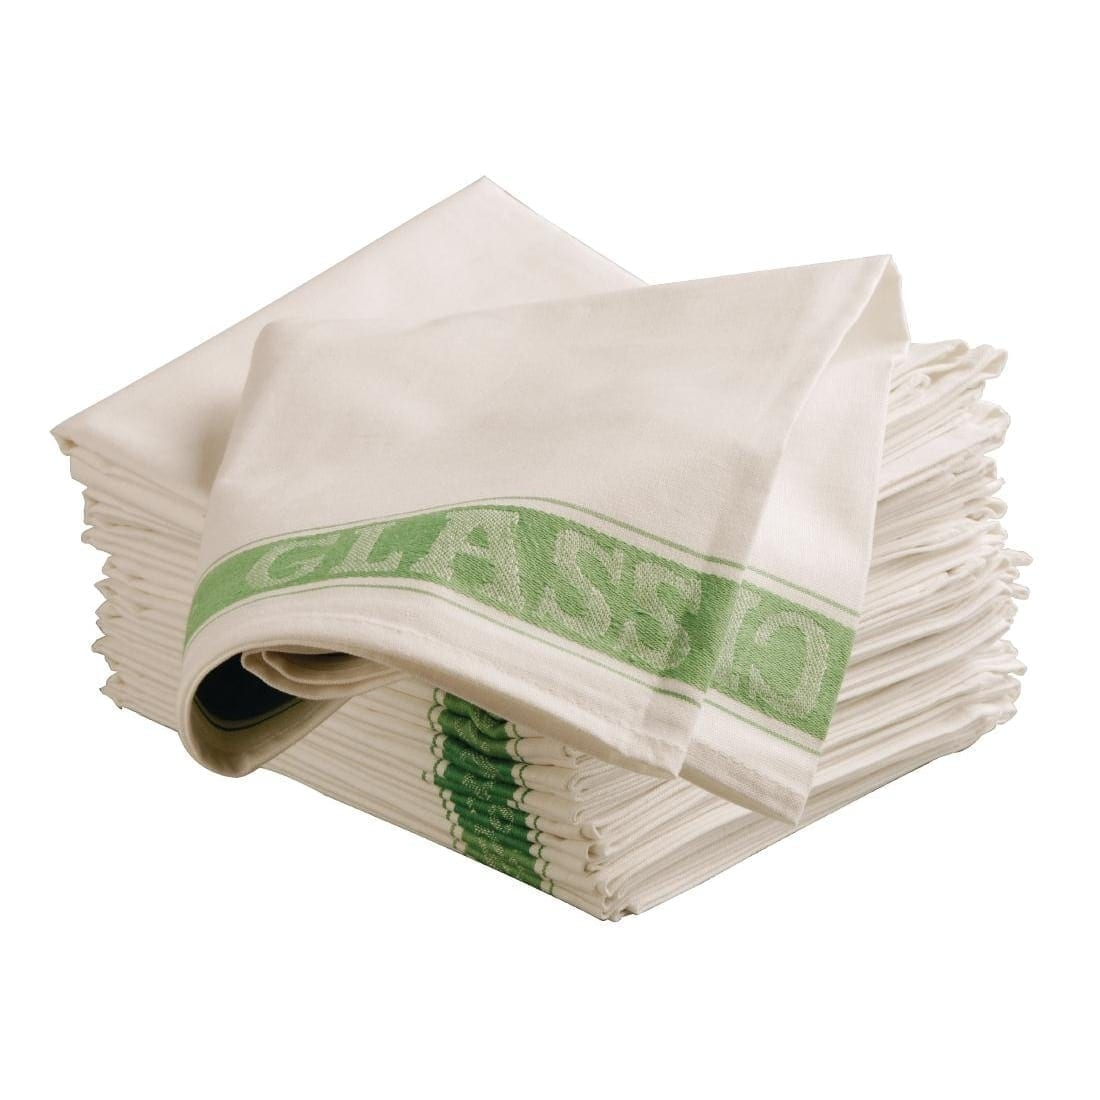 "Glass Cloth Linen Union Green Border - 30 x 20"" - Each"